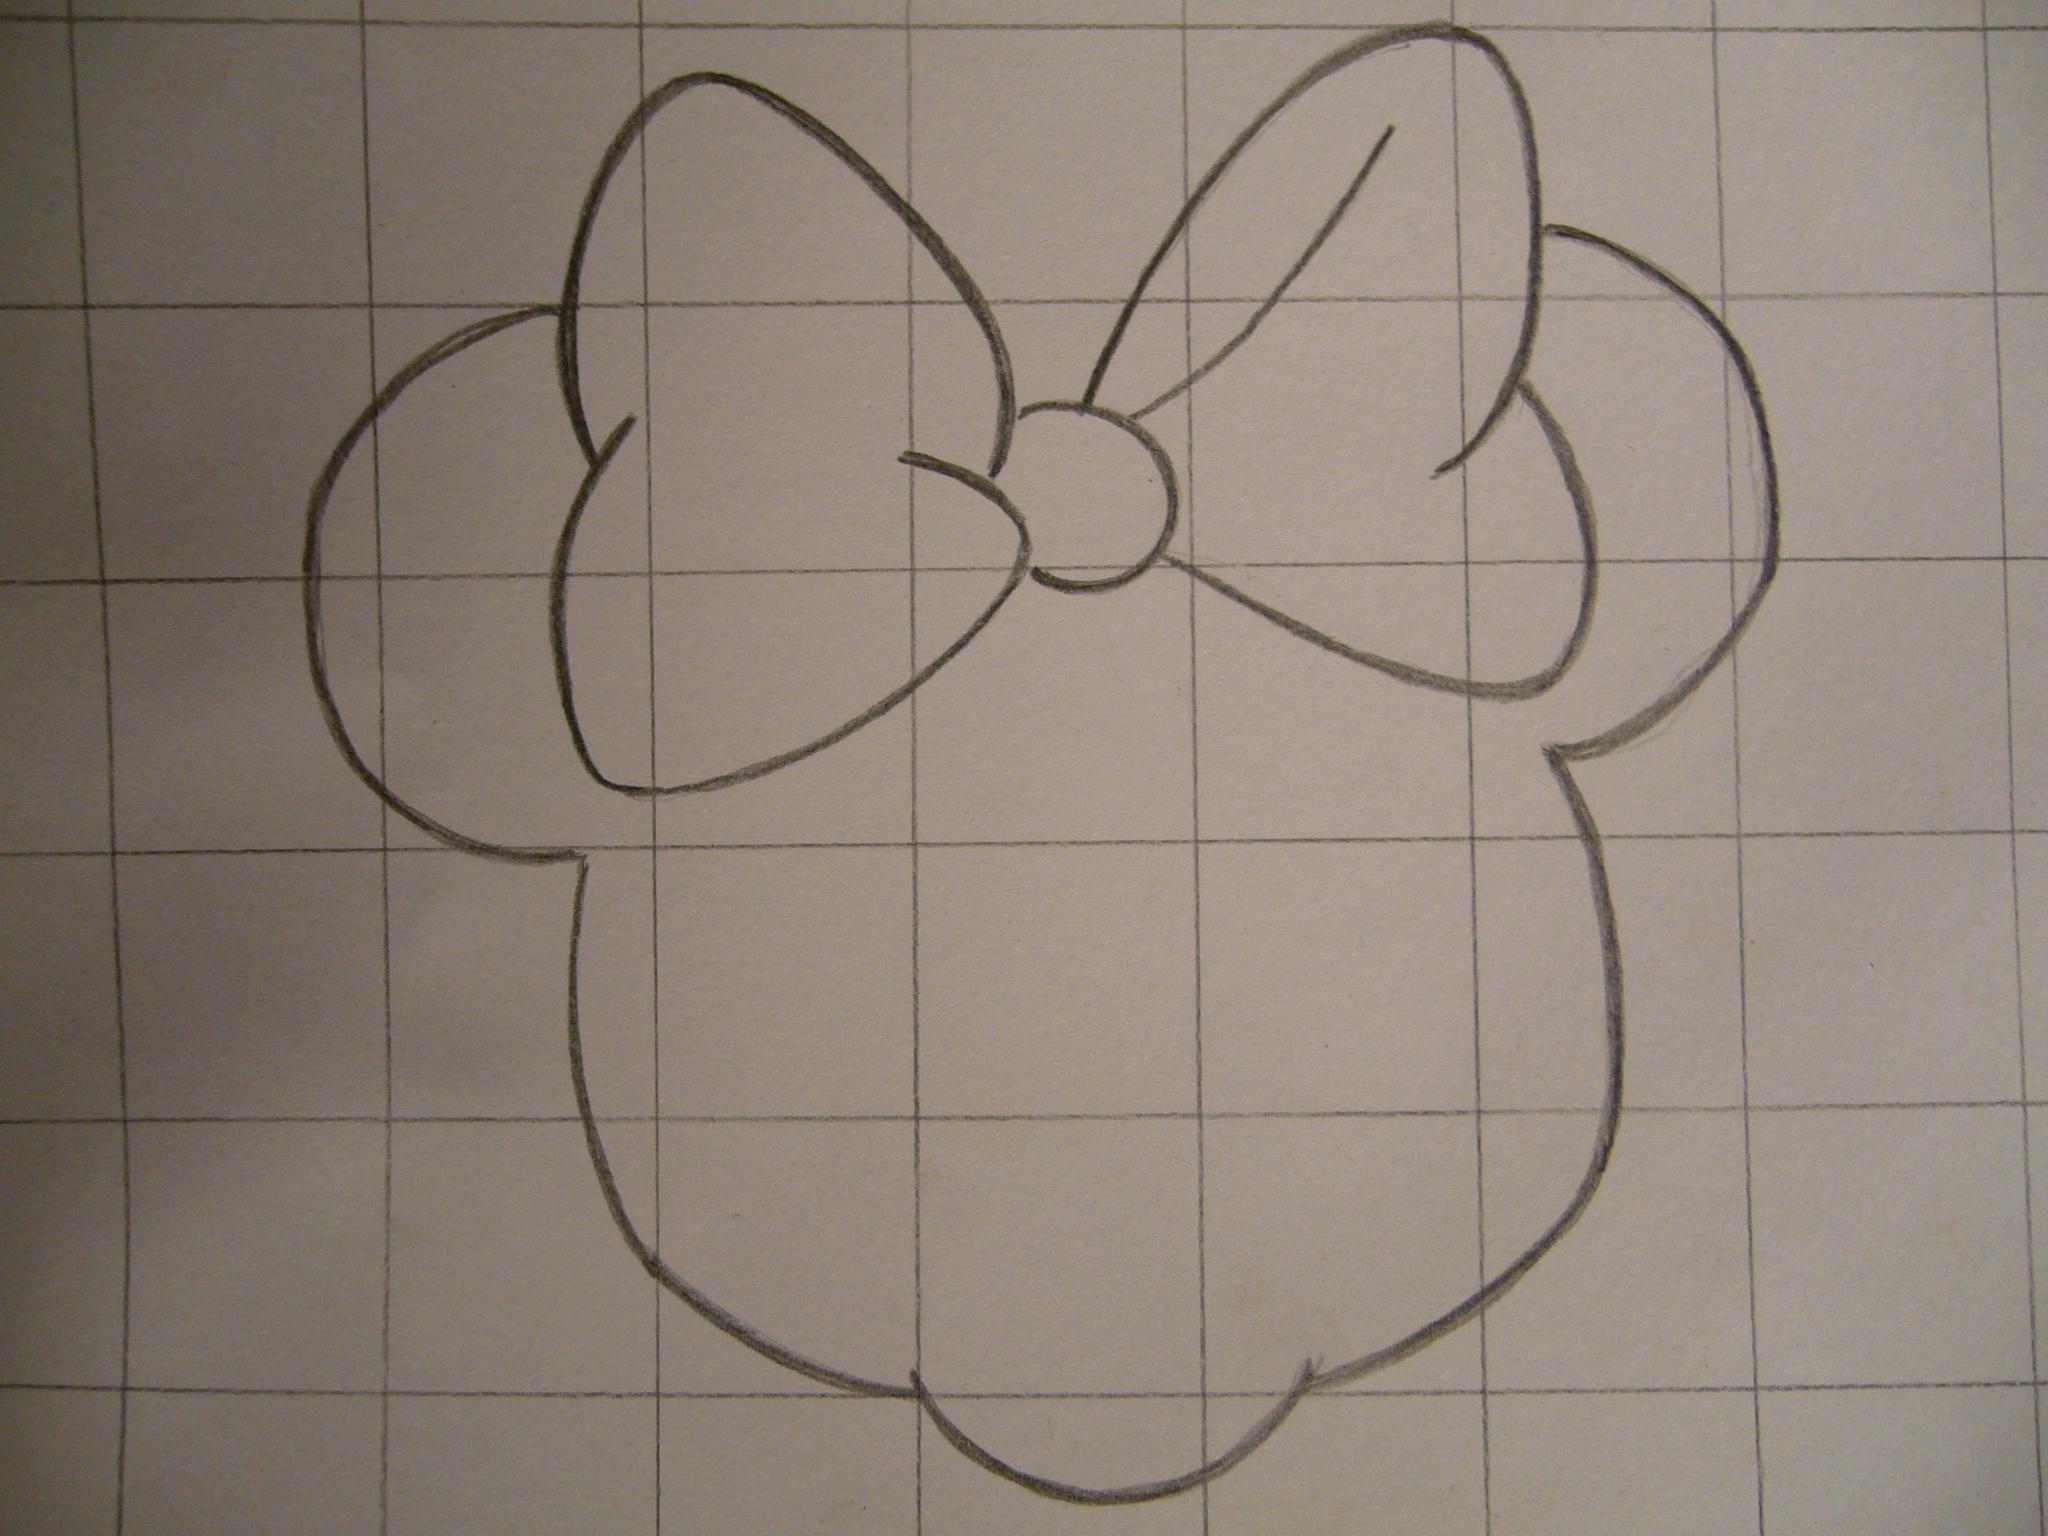 Image Detail for - Paso 3 de 9 - Cómo dibujar la cara de Minnie Mouse